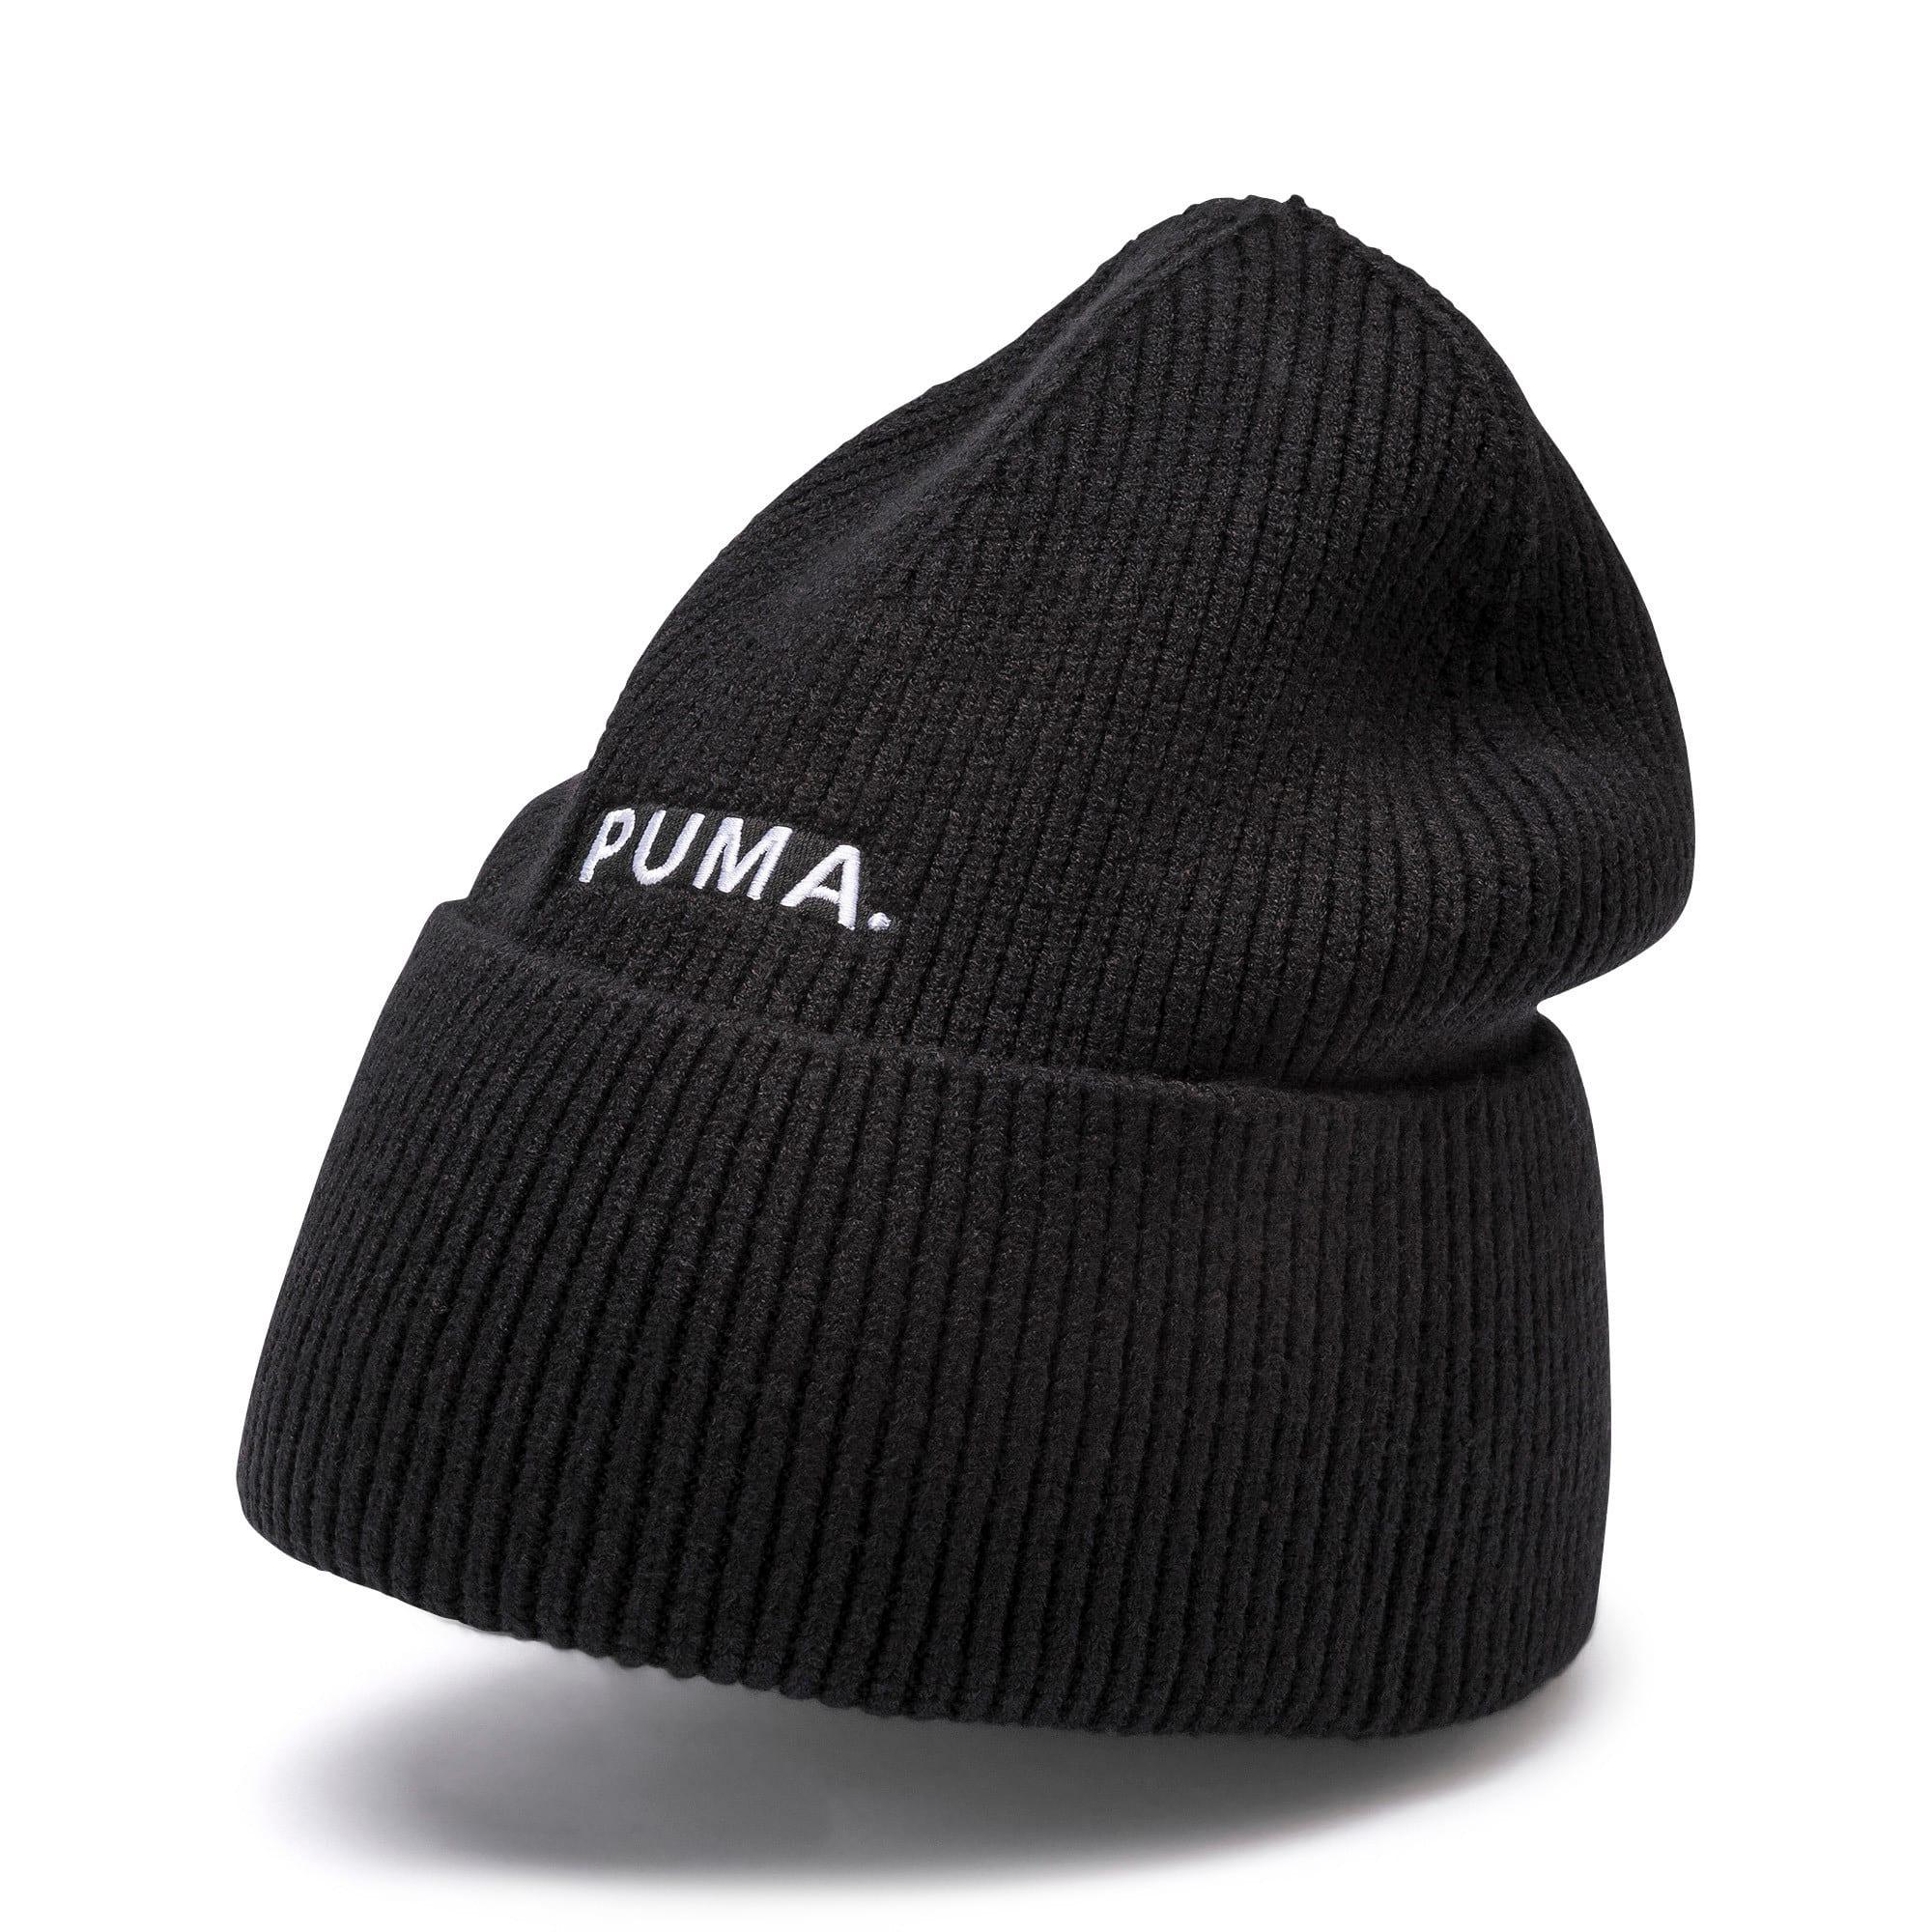 Miniatura 1 de Gorro de lana Hybrid Fit Trend, Puma Black, mediano